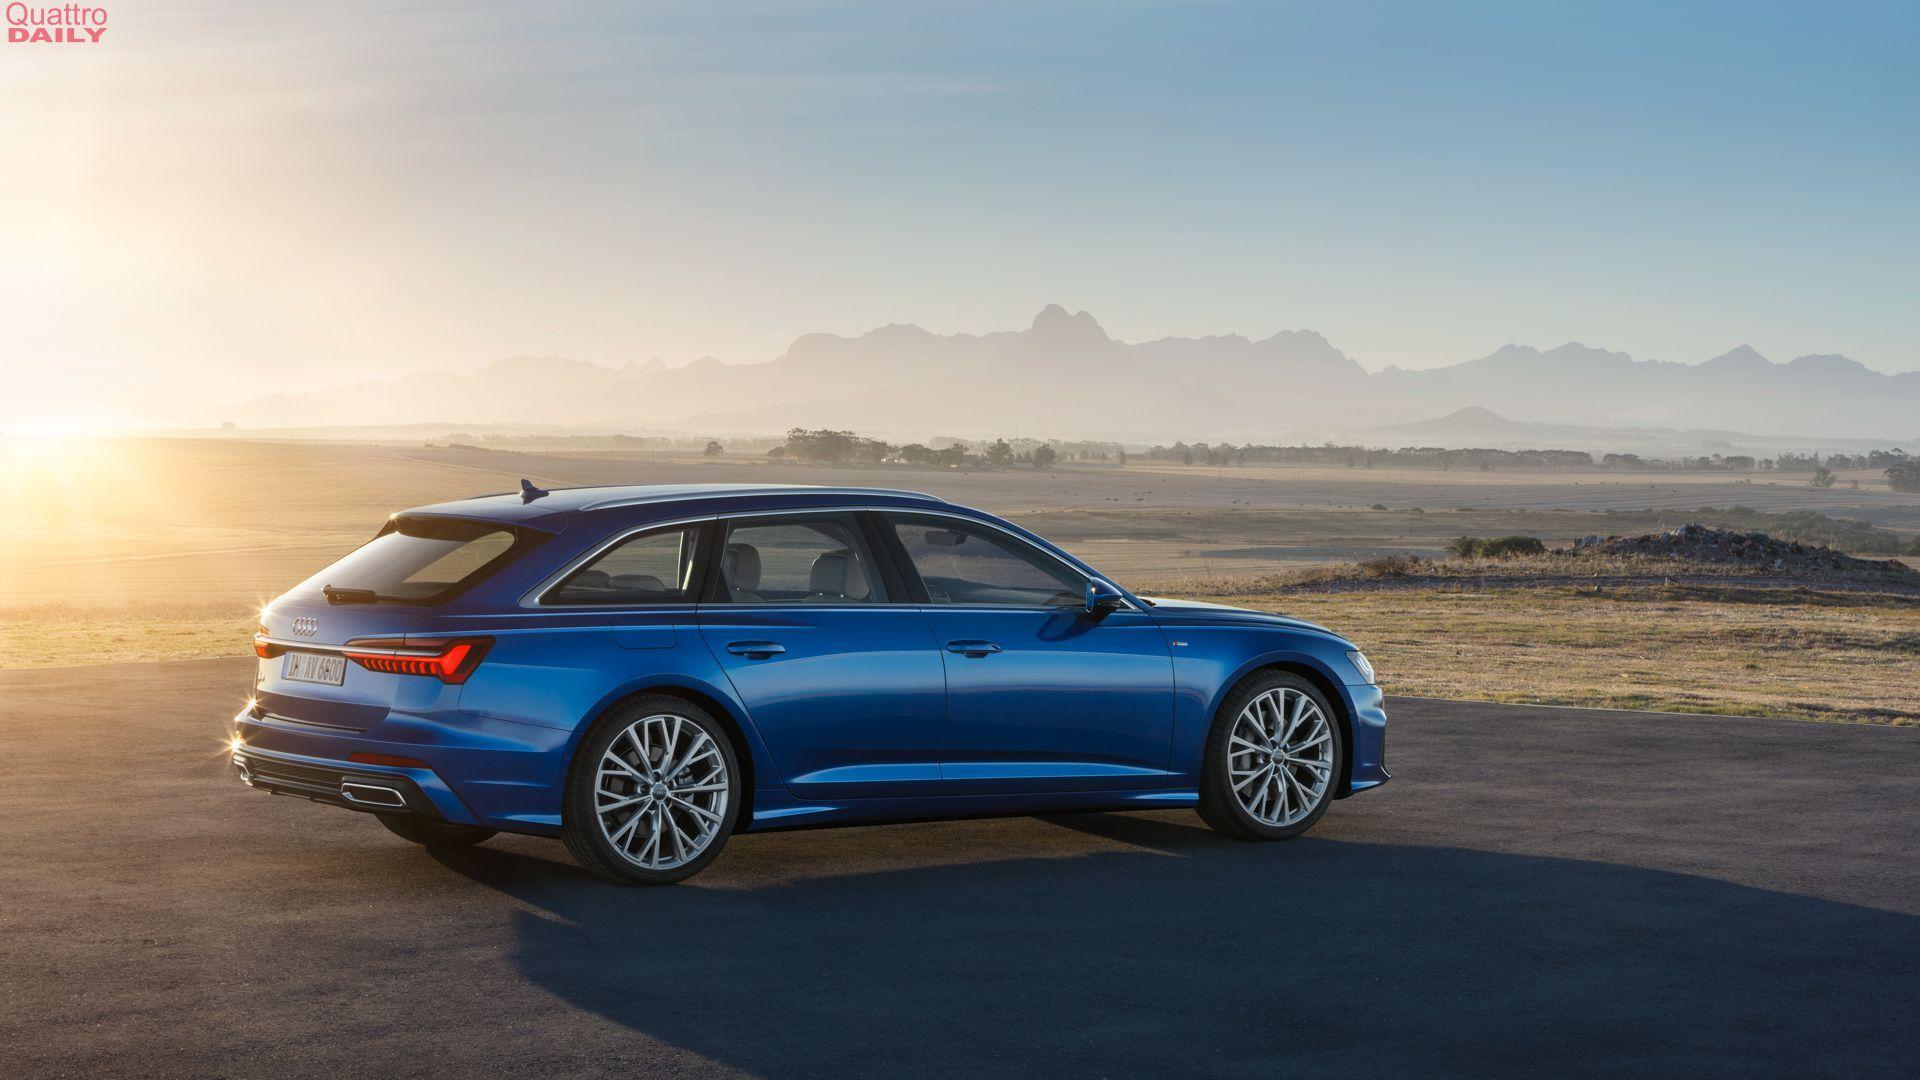 2020 Audi Rs6 Avant 2020 Audi Rs6 Avant 2020 Audi Rs6 Avant Price 2020 Audi Rs6 Avant Specs 2020 Audi Rs6 Avant Usa 2020 Audi Audi Rs6 Audi A6 Avant Audi